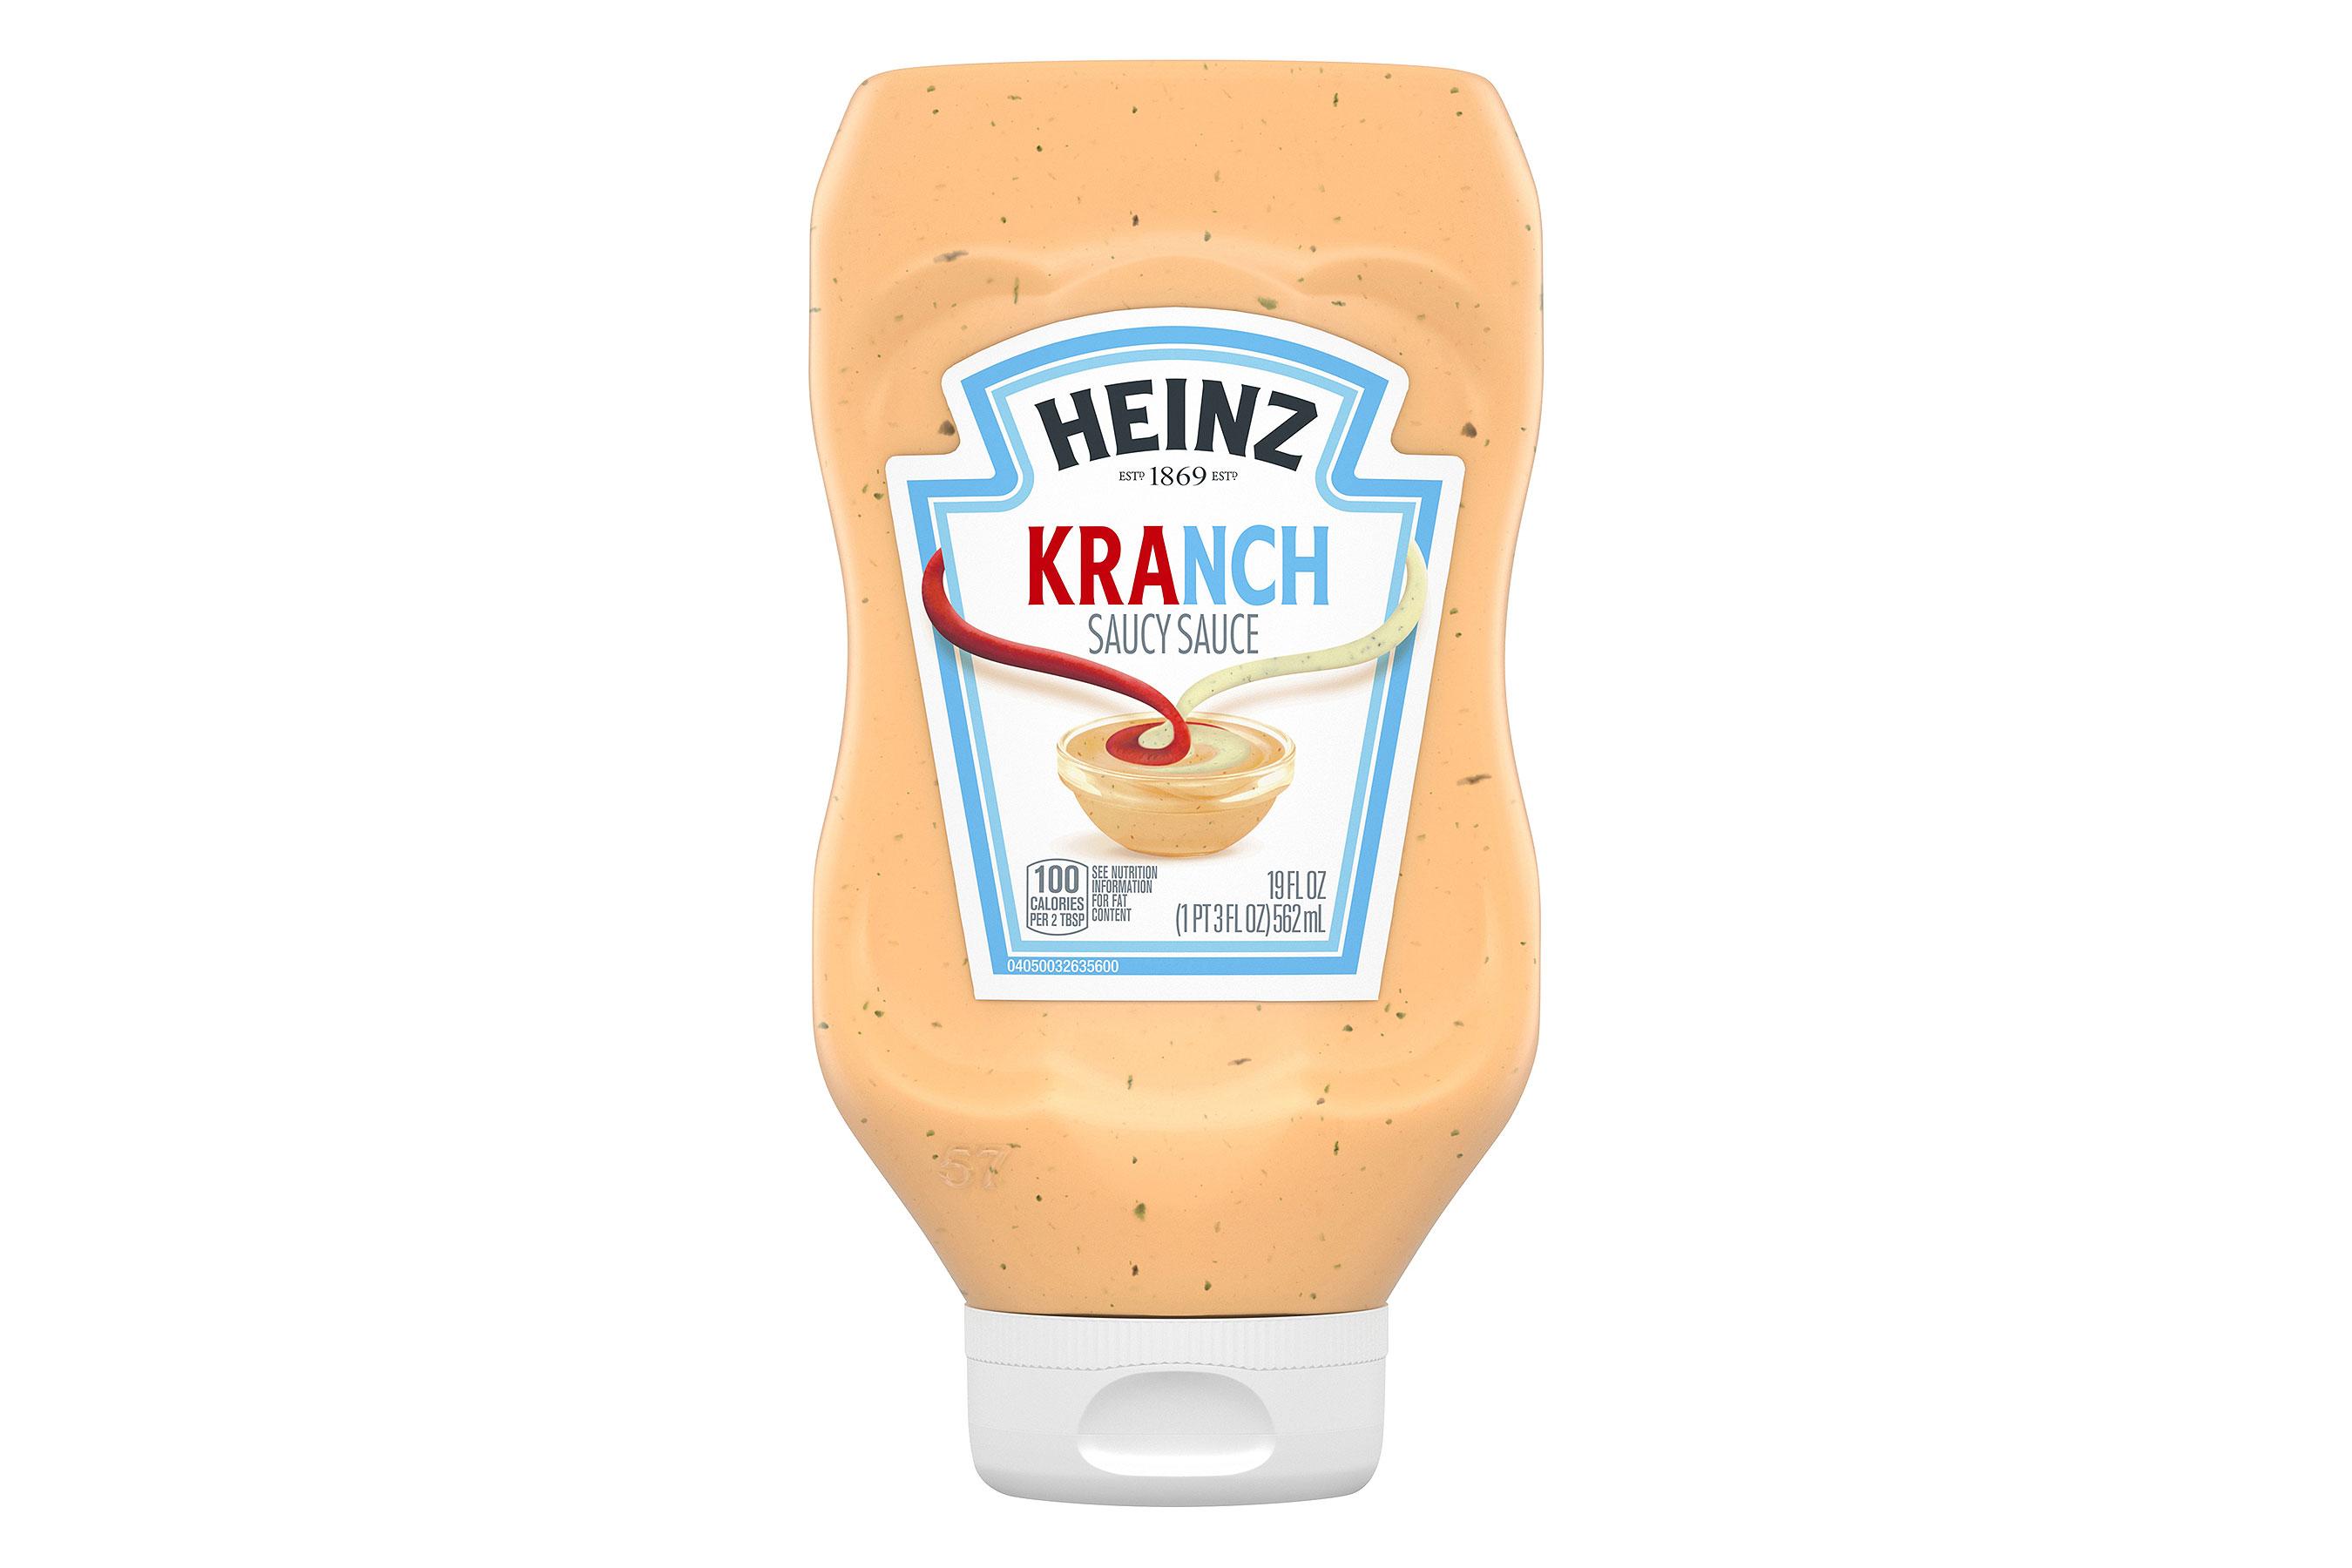 Kranch-Saucy-Sauce